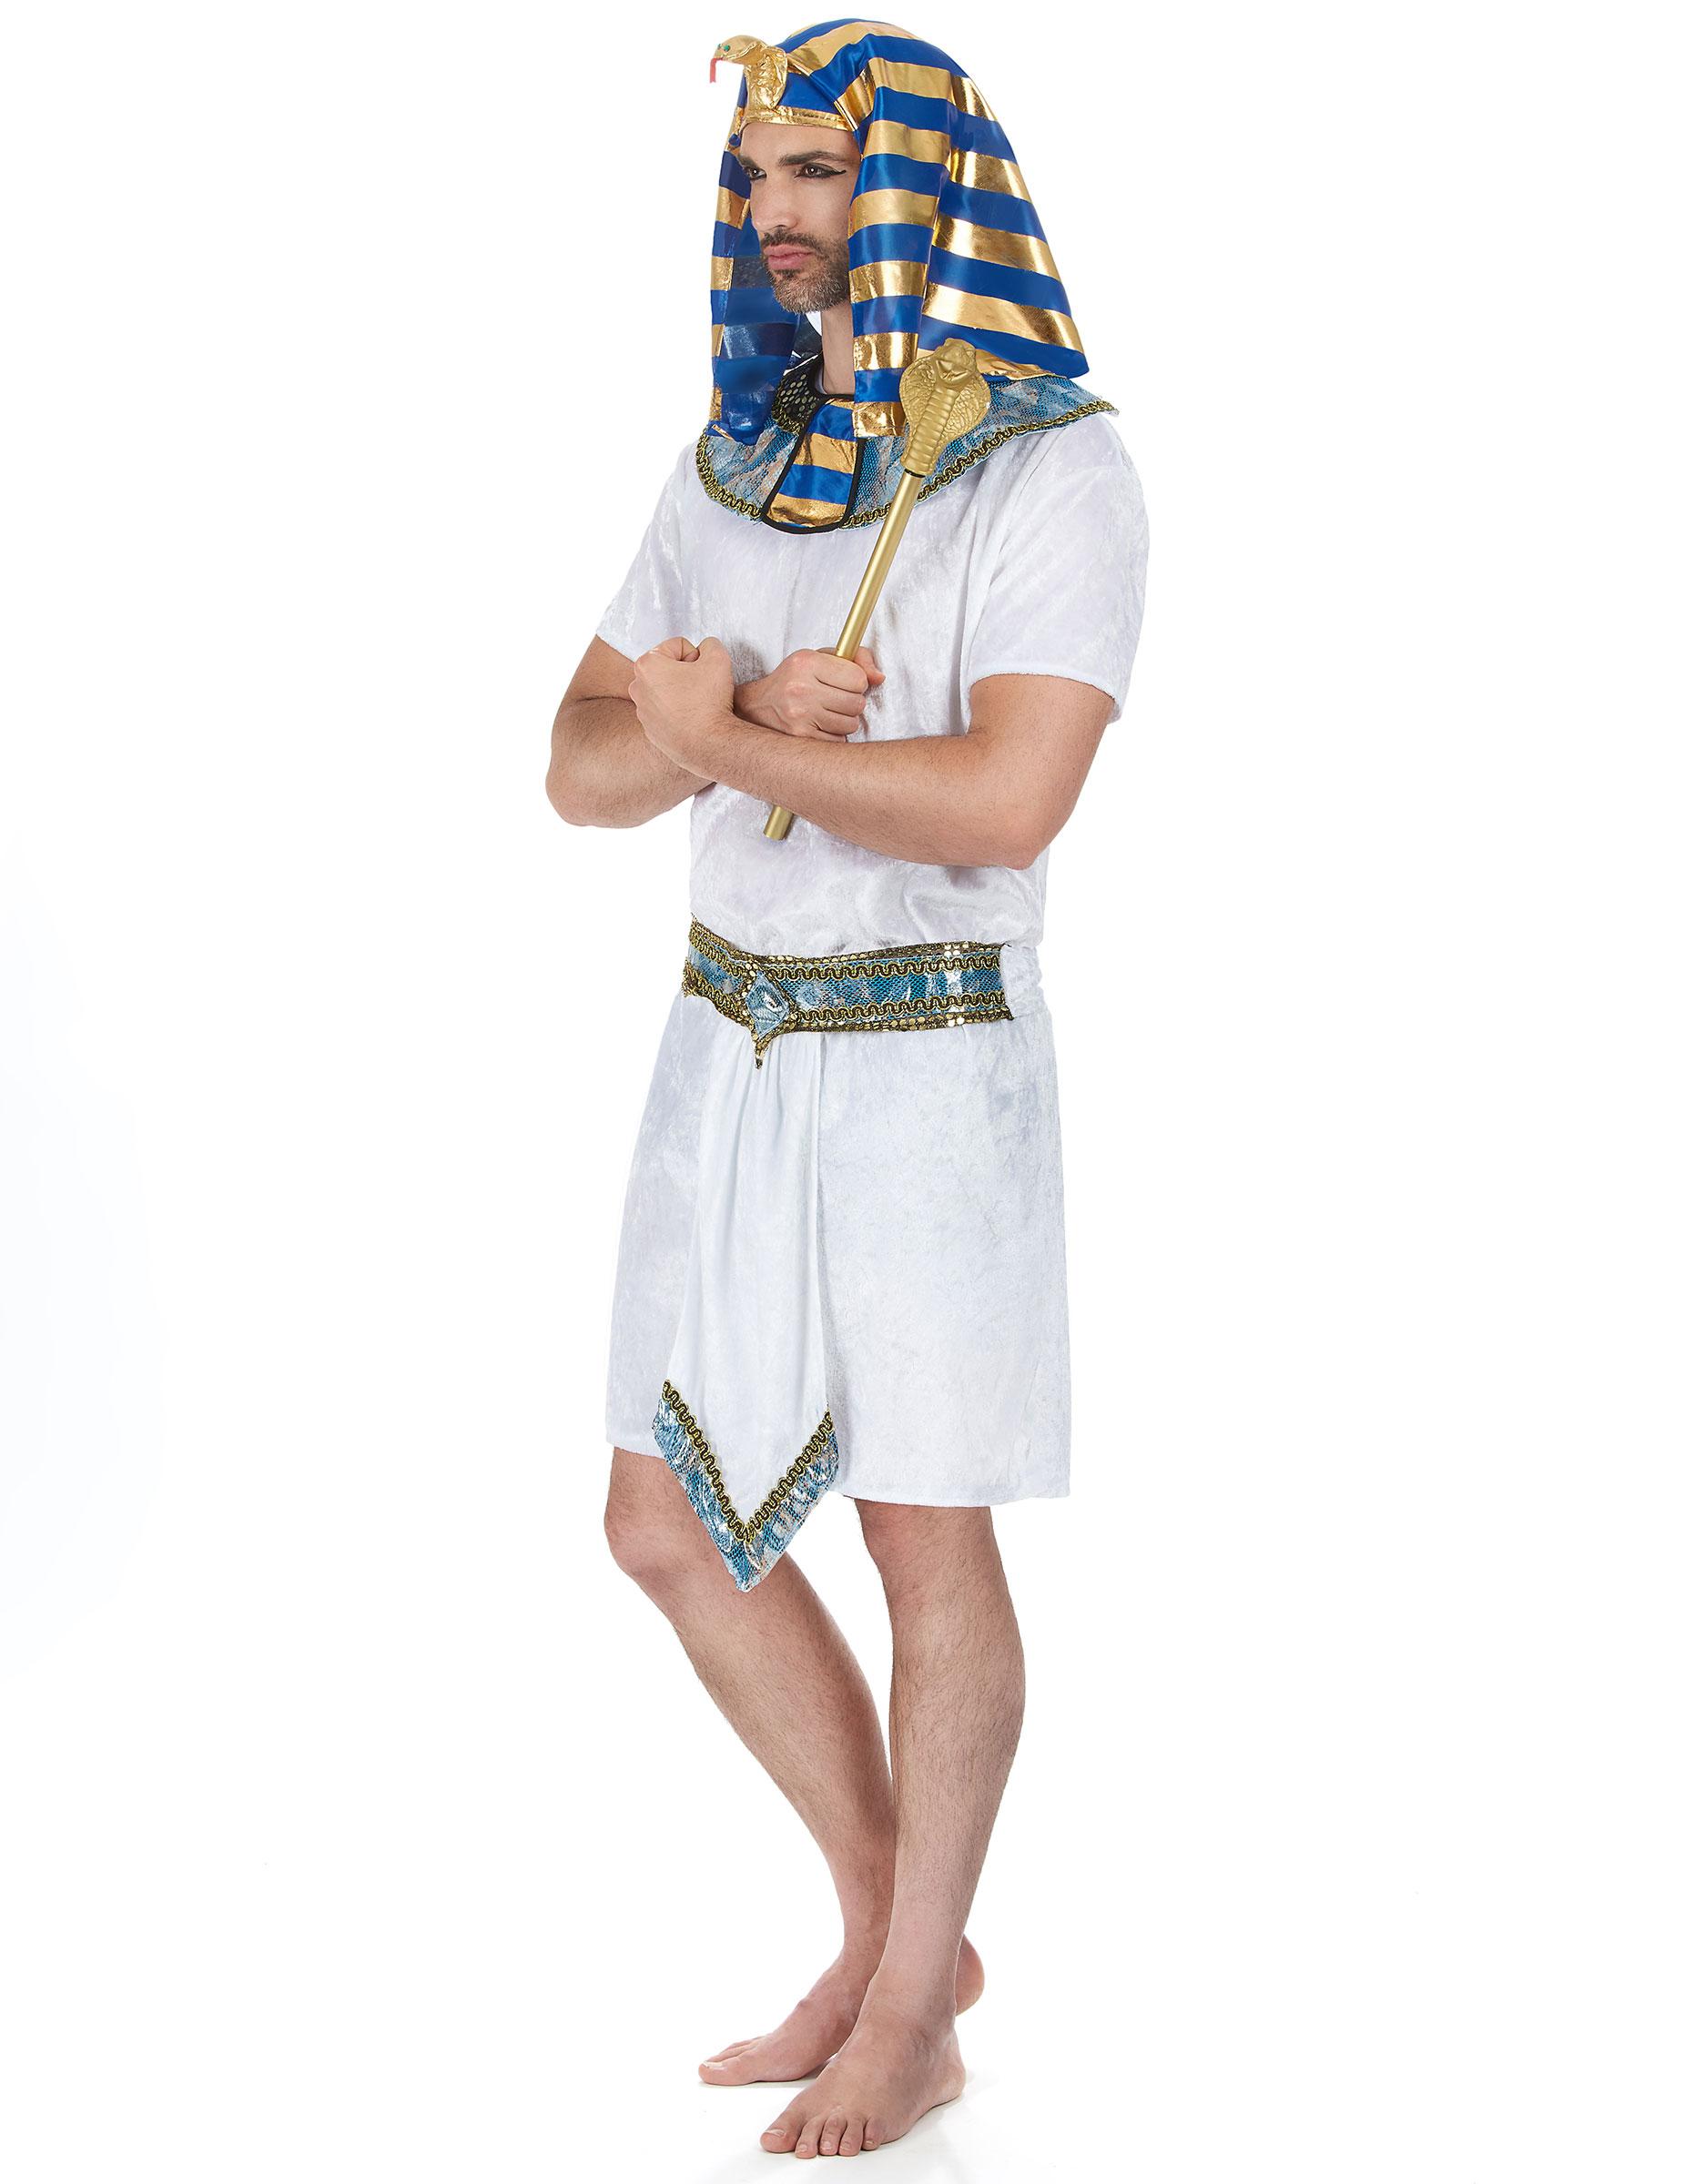 pharaonen kost m f r herren kost me f r erwachsene und g nstige faschingskost me vegaoo. Black Bedroom Furniture Sets. Home Design Ideas